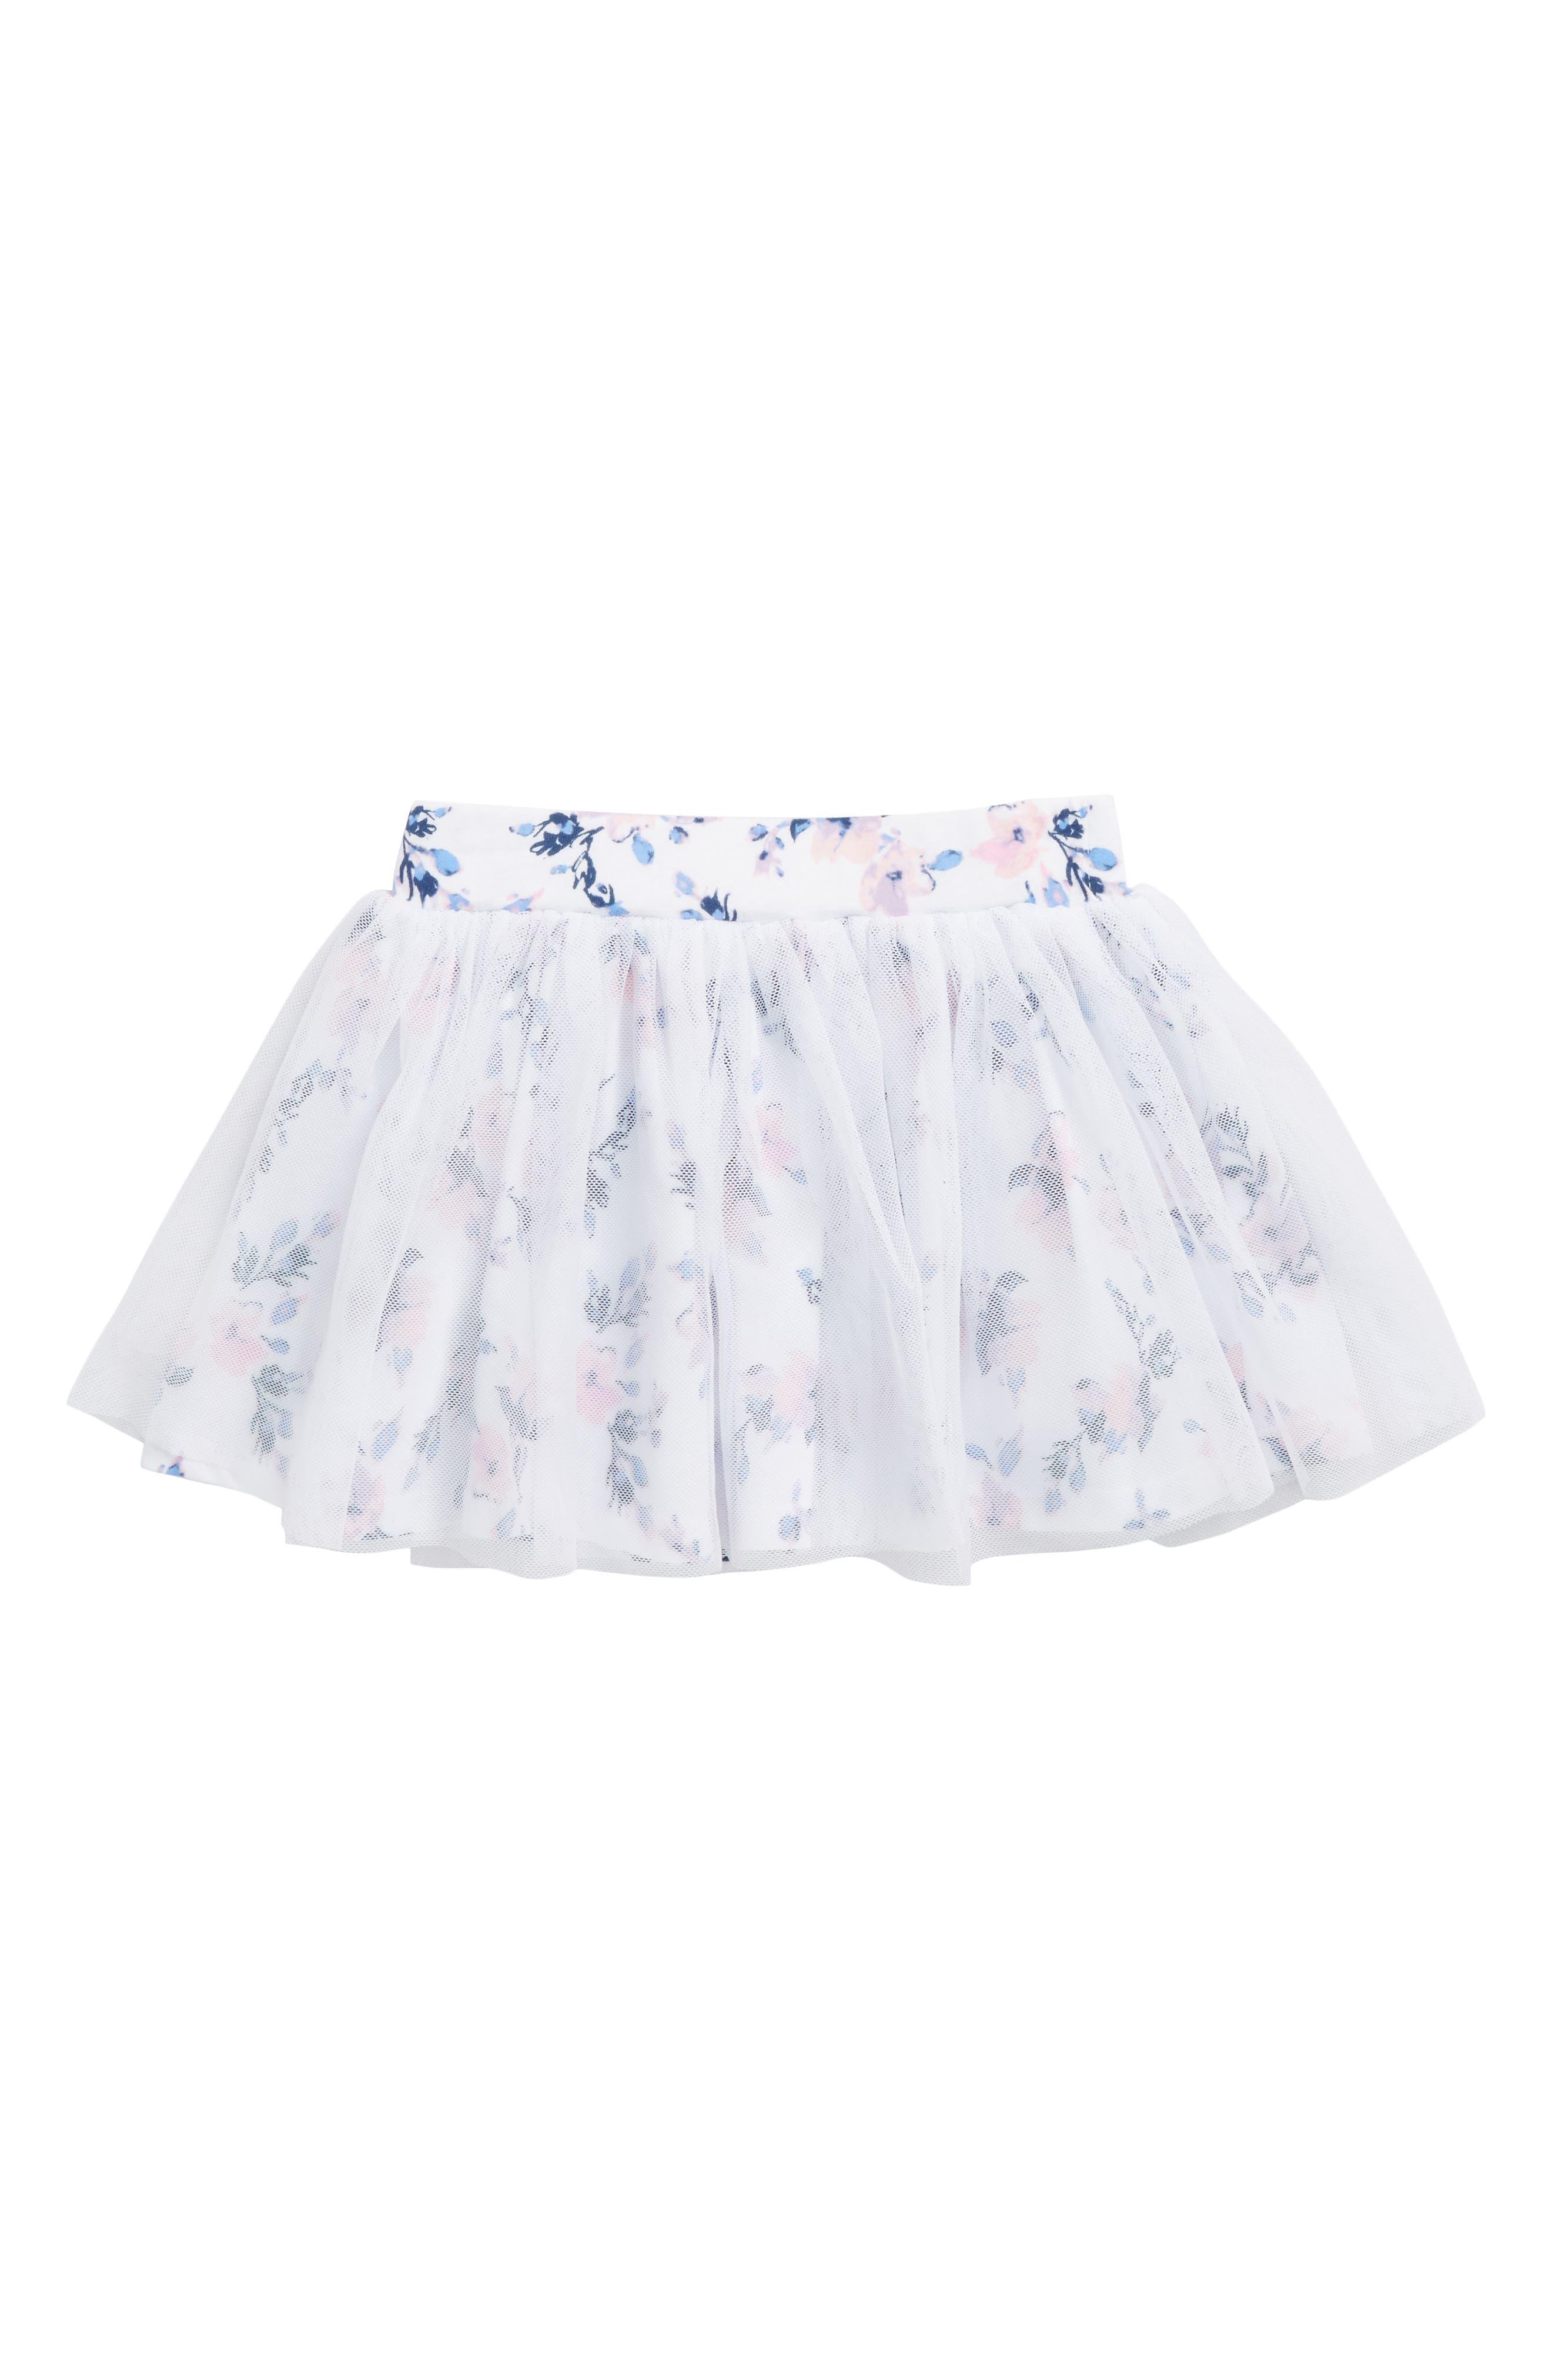 Flower Print Tutu Skirt,                         Main,                         color, 100